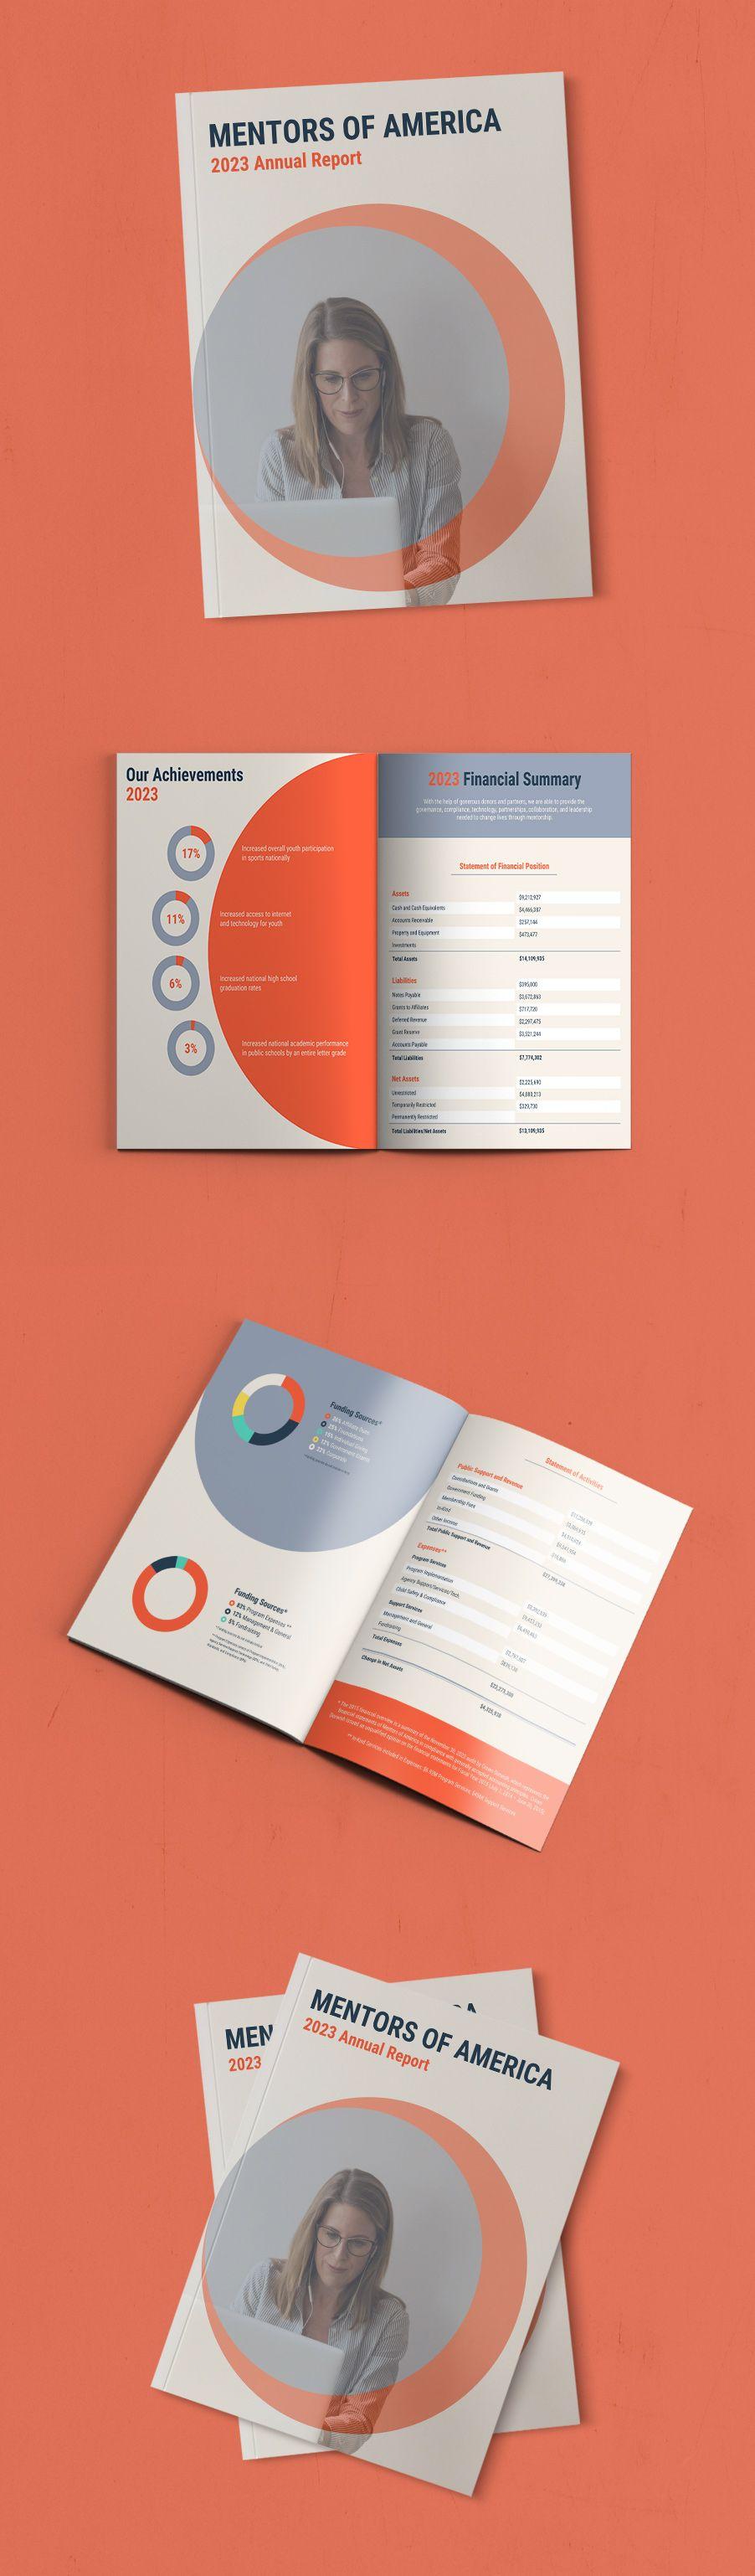 Nonprofit Annual Report Template Template #annualreports